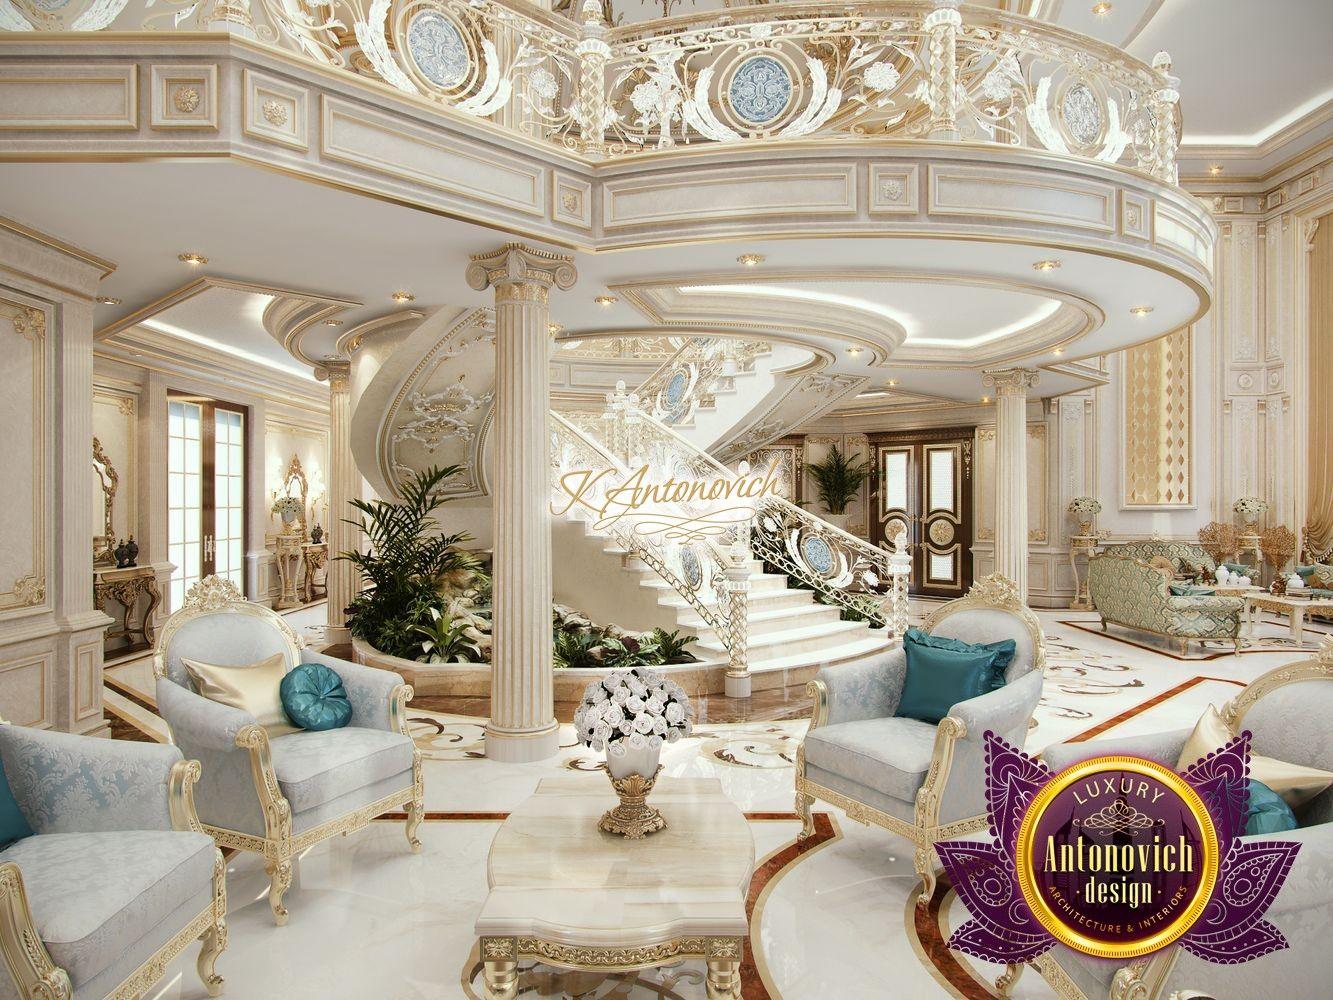 Design your dream house | houses / apartments / mansion | Pinterest ...